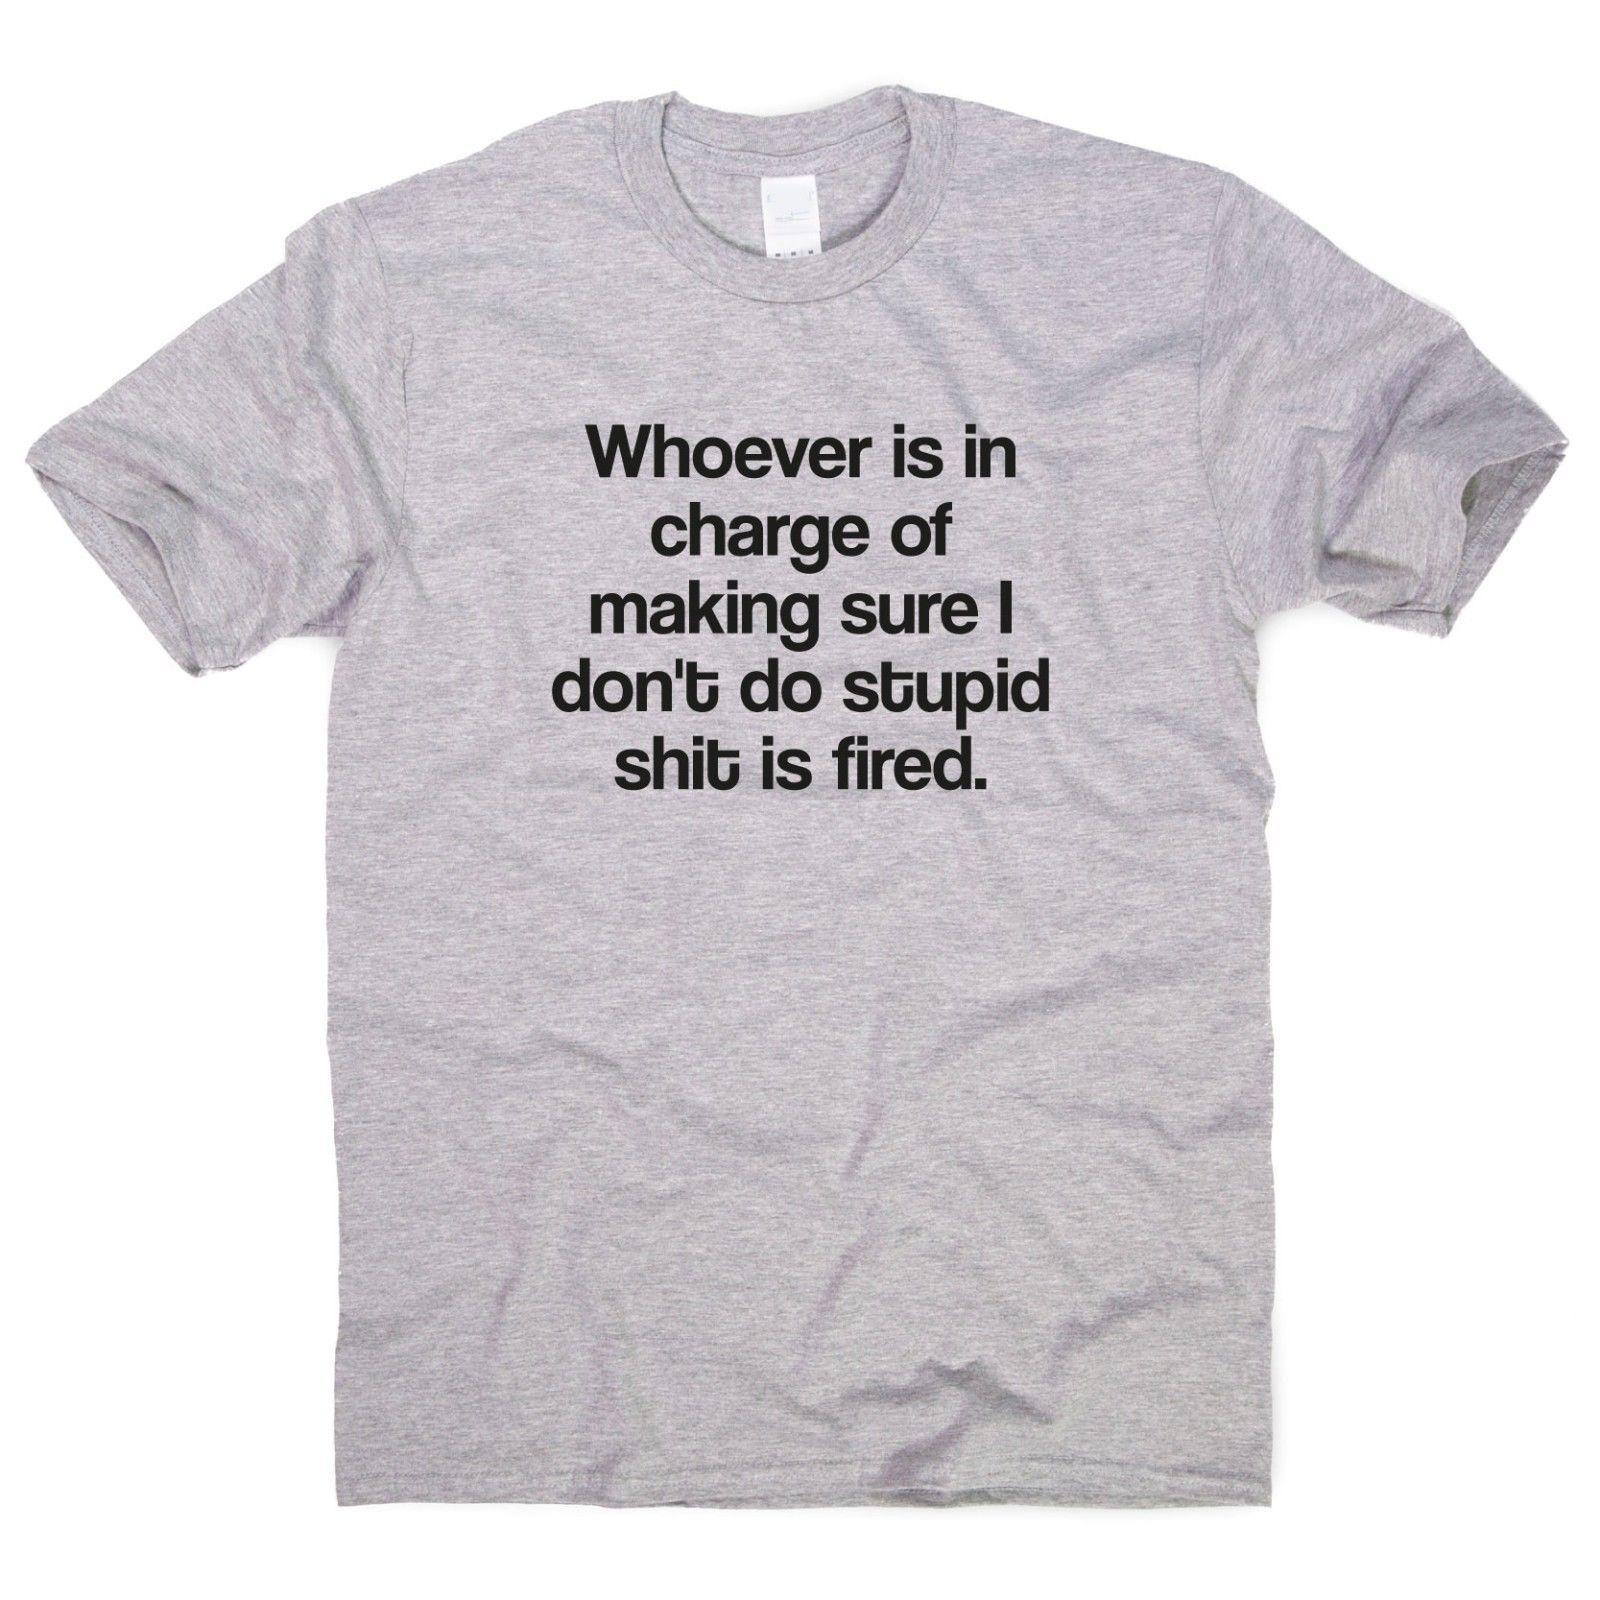 SHIT  SHIRT Humour Gift sarcasm rude funny mens t shirt christmas  gift